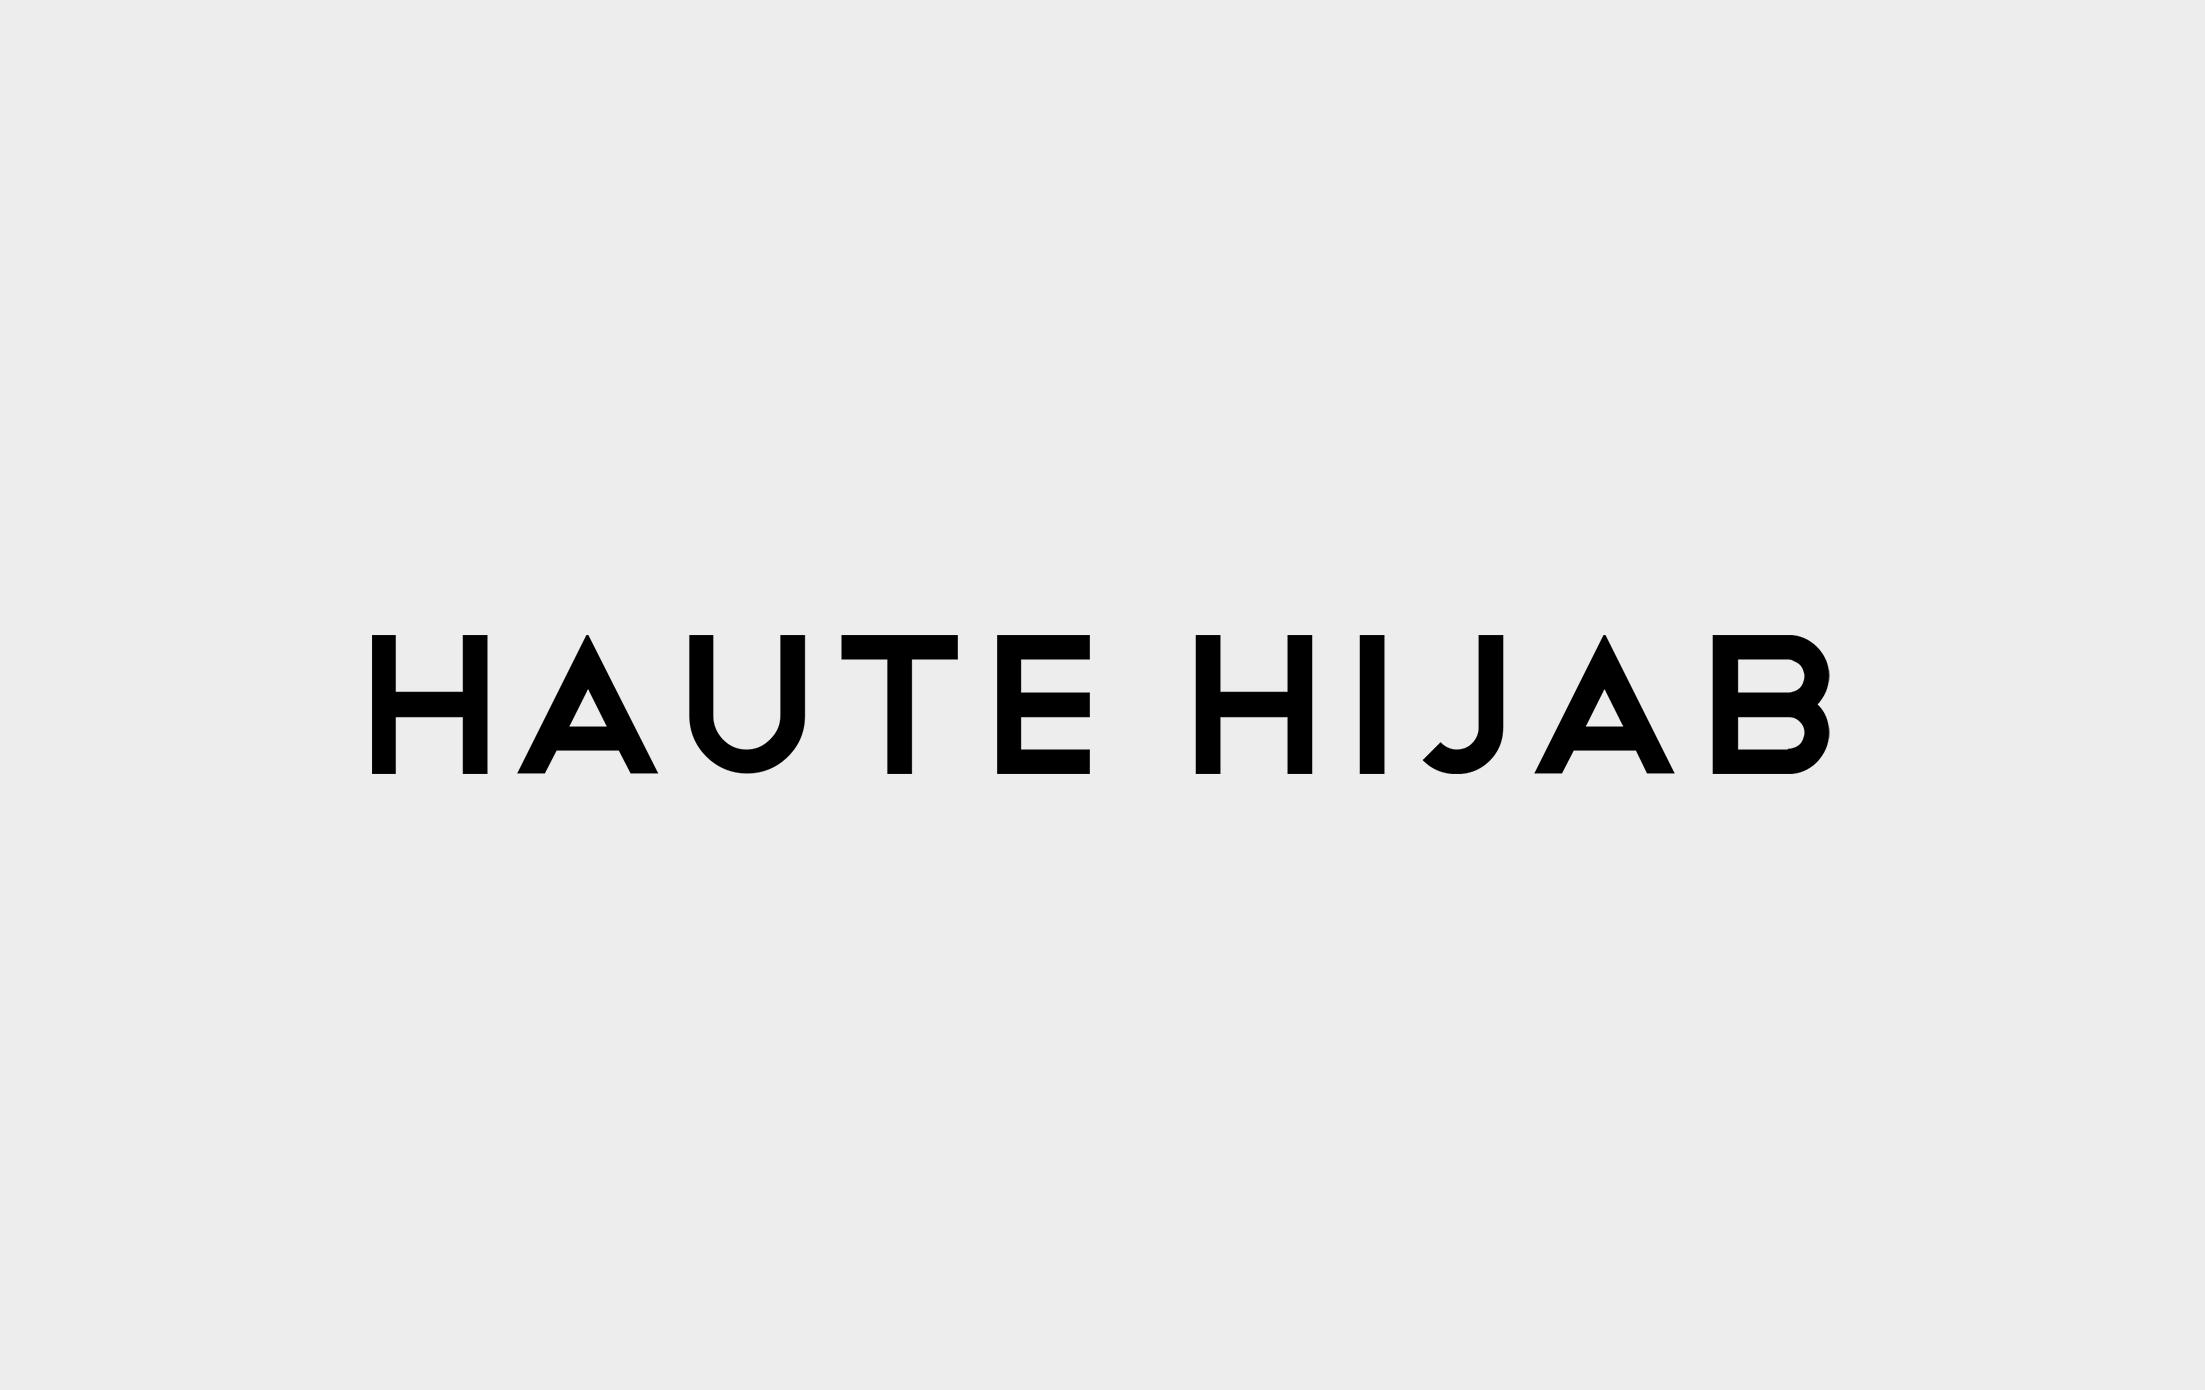 haute-hijab-2.jpg